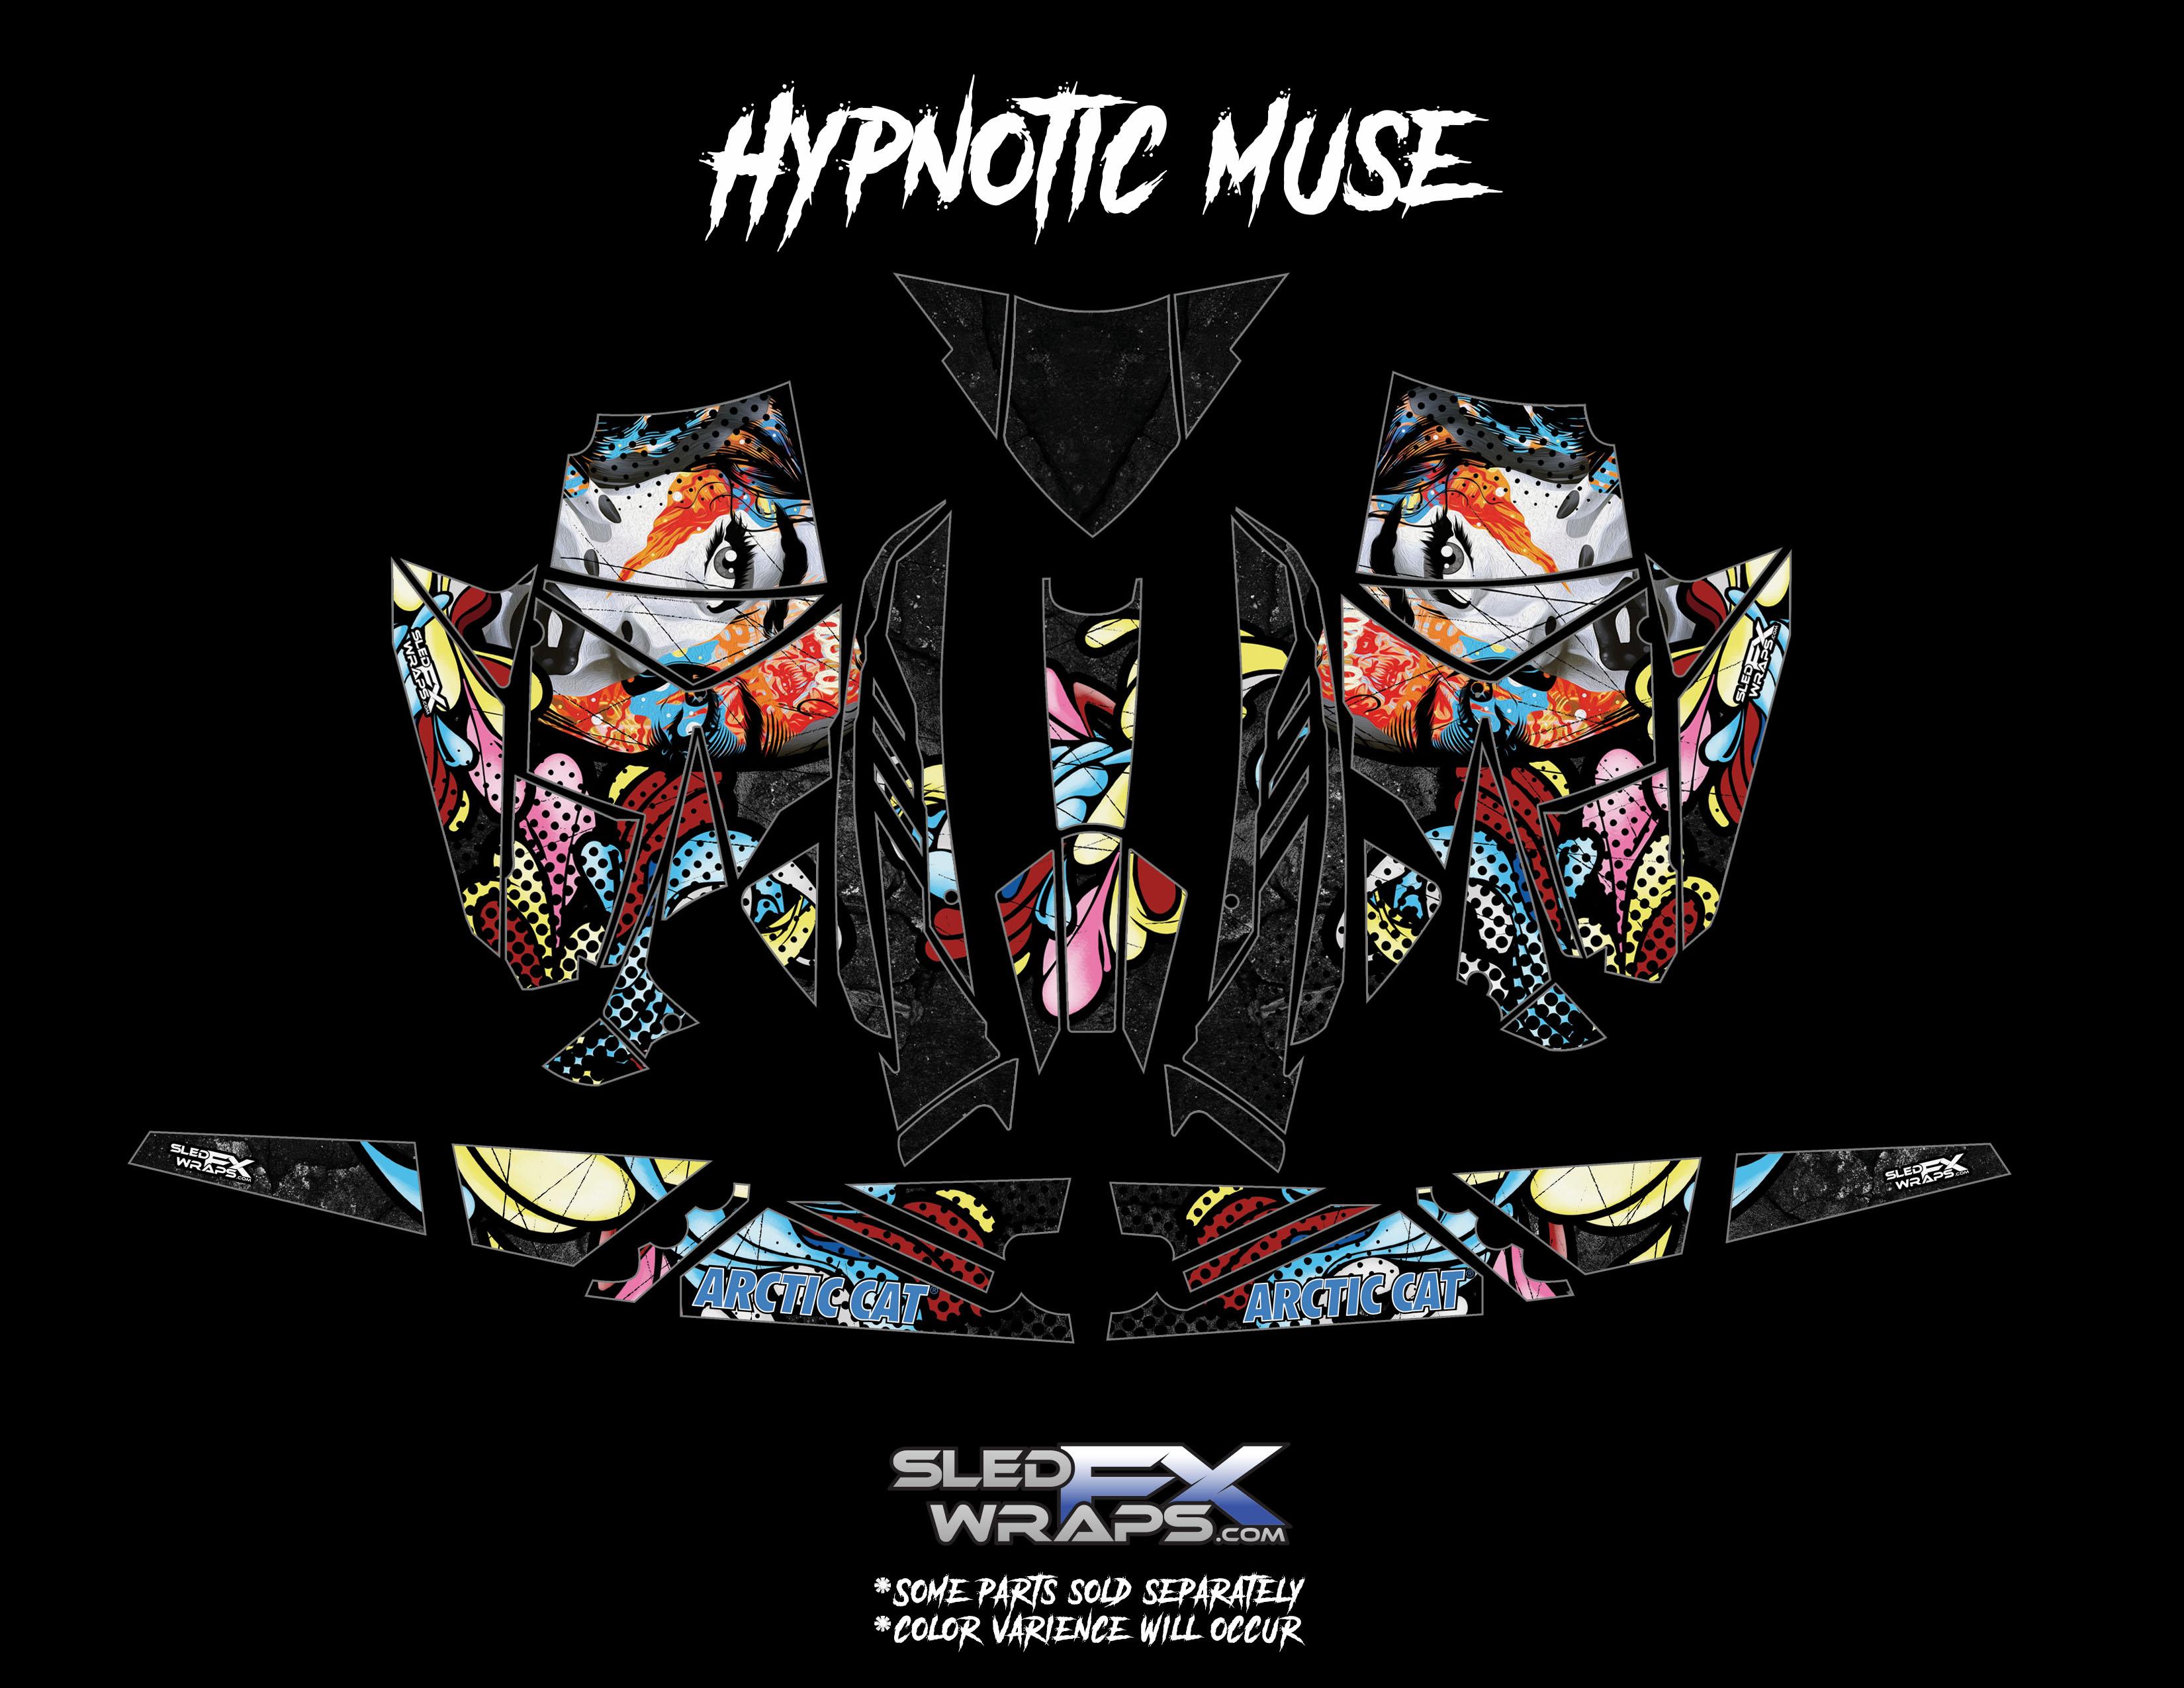 HypnoticMuse